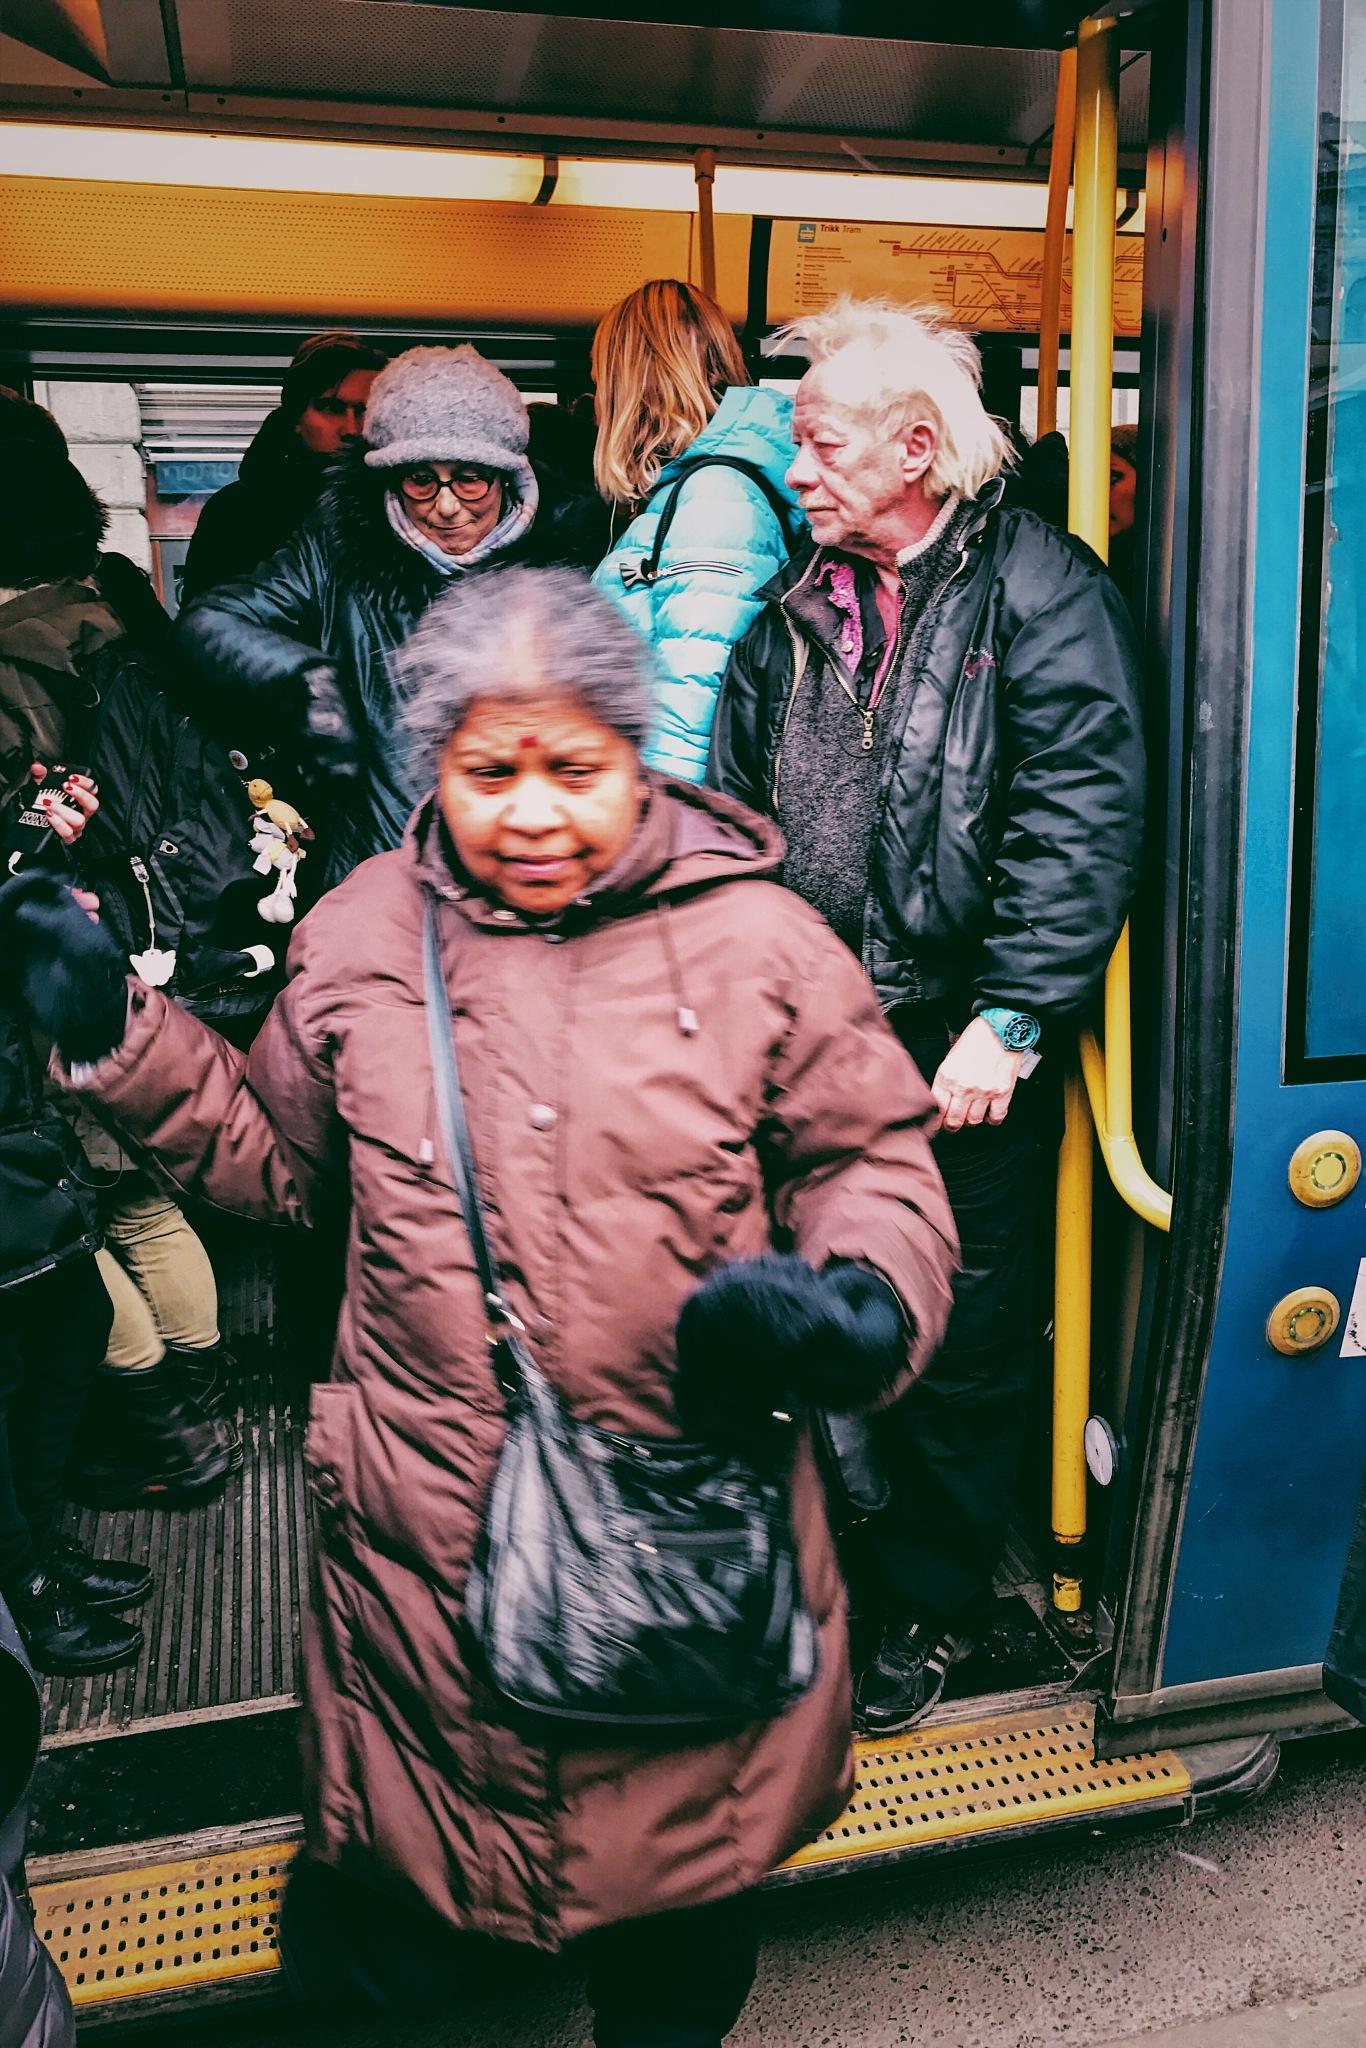 Happy commuter by Goran Jorganovich